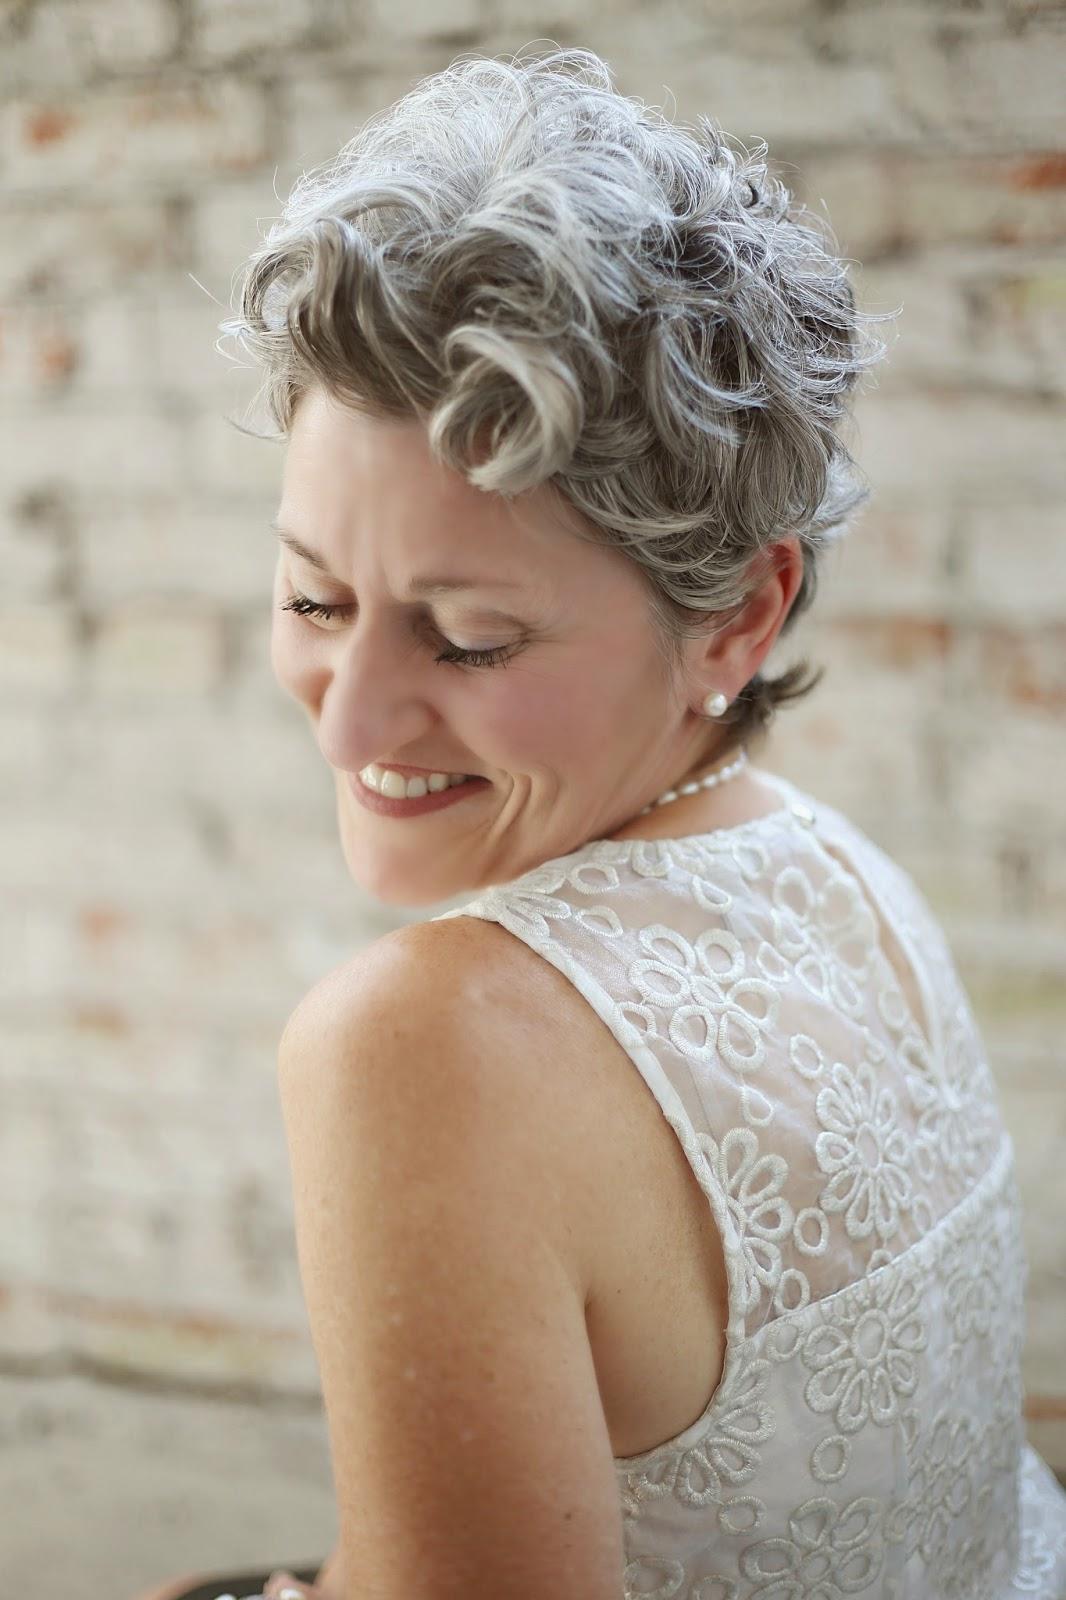 Spotted Stills Photography, portrait, head shot, portland, oregon, studio, natural light, jenn pacurar